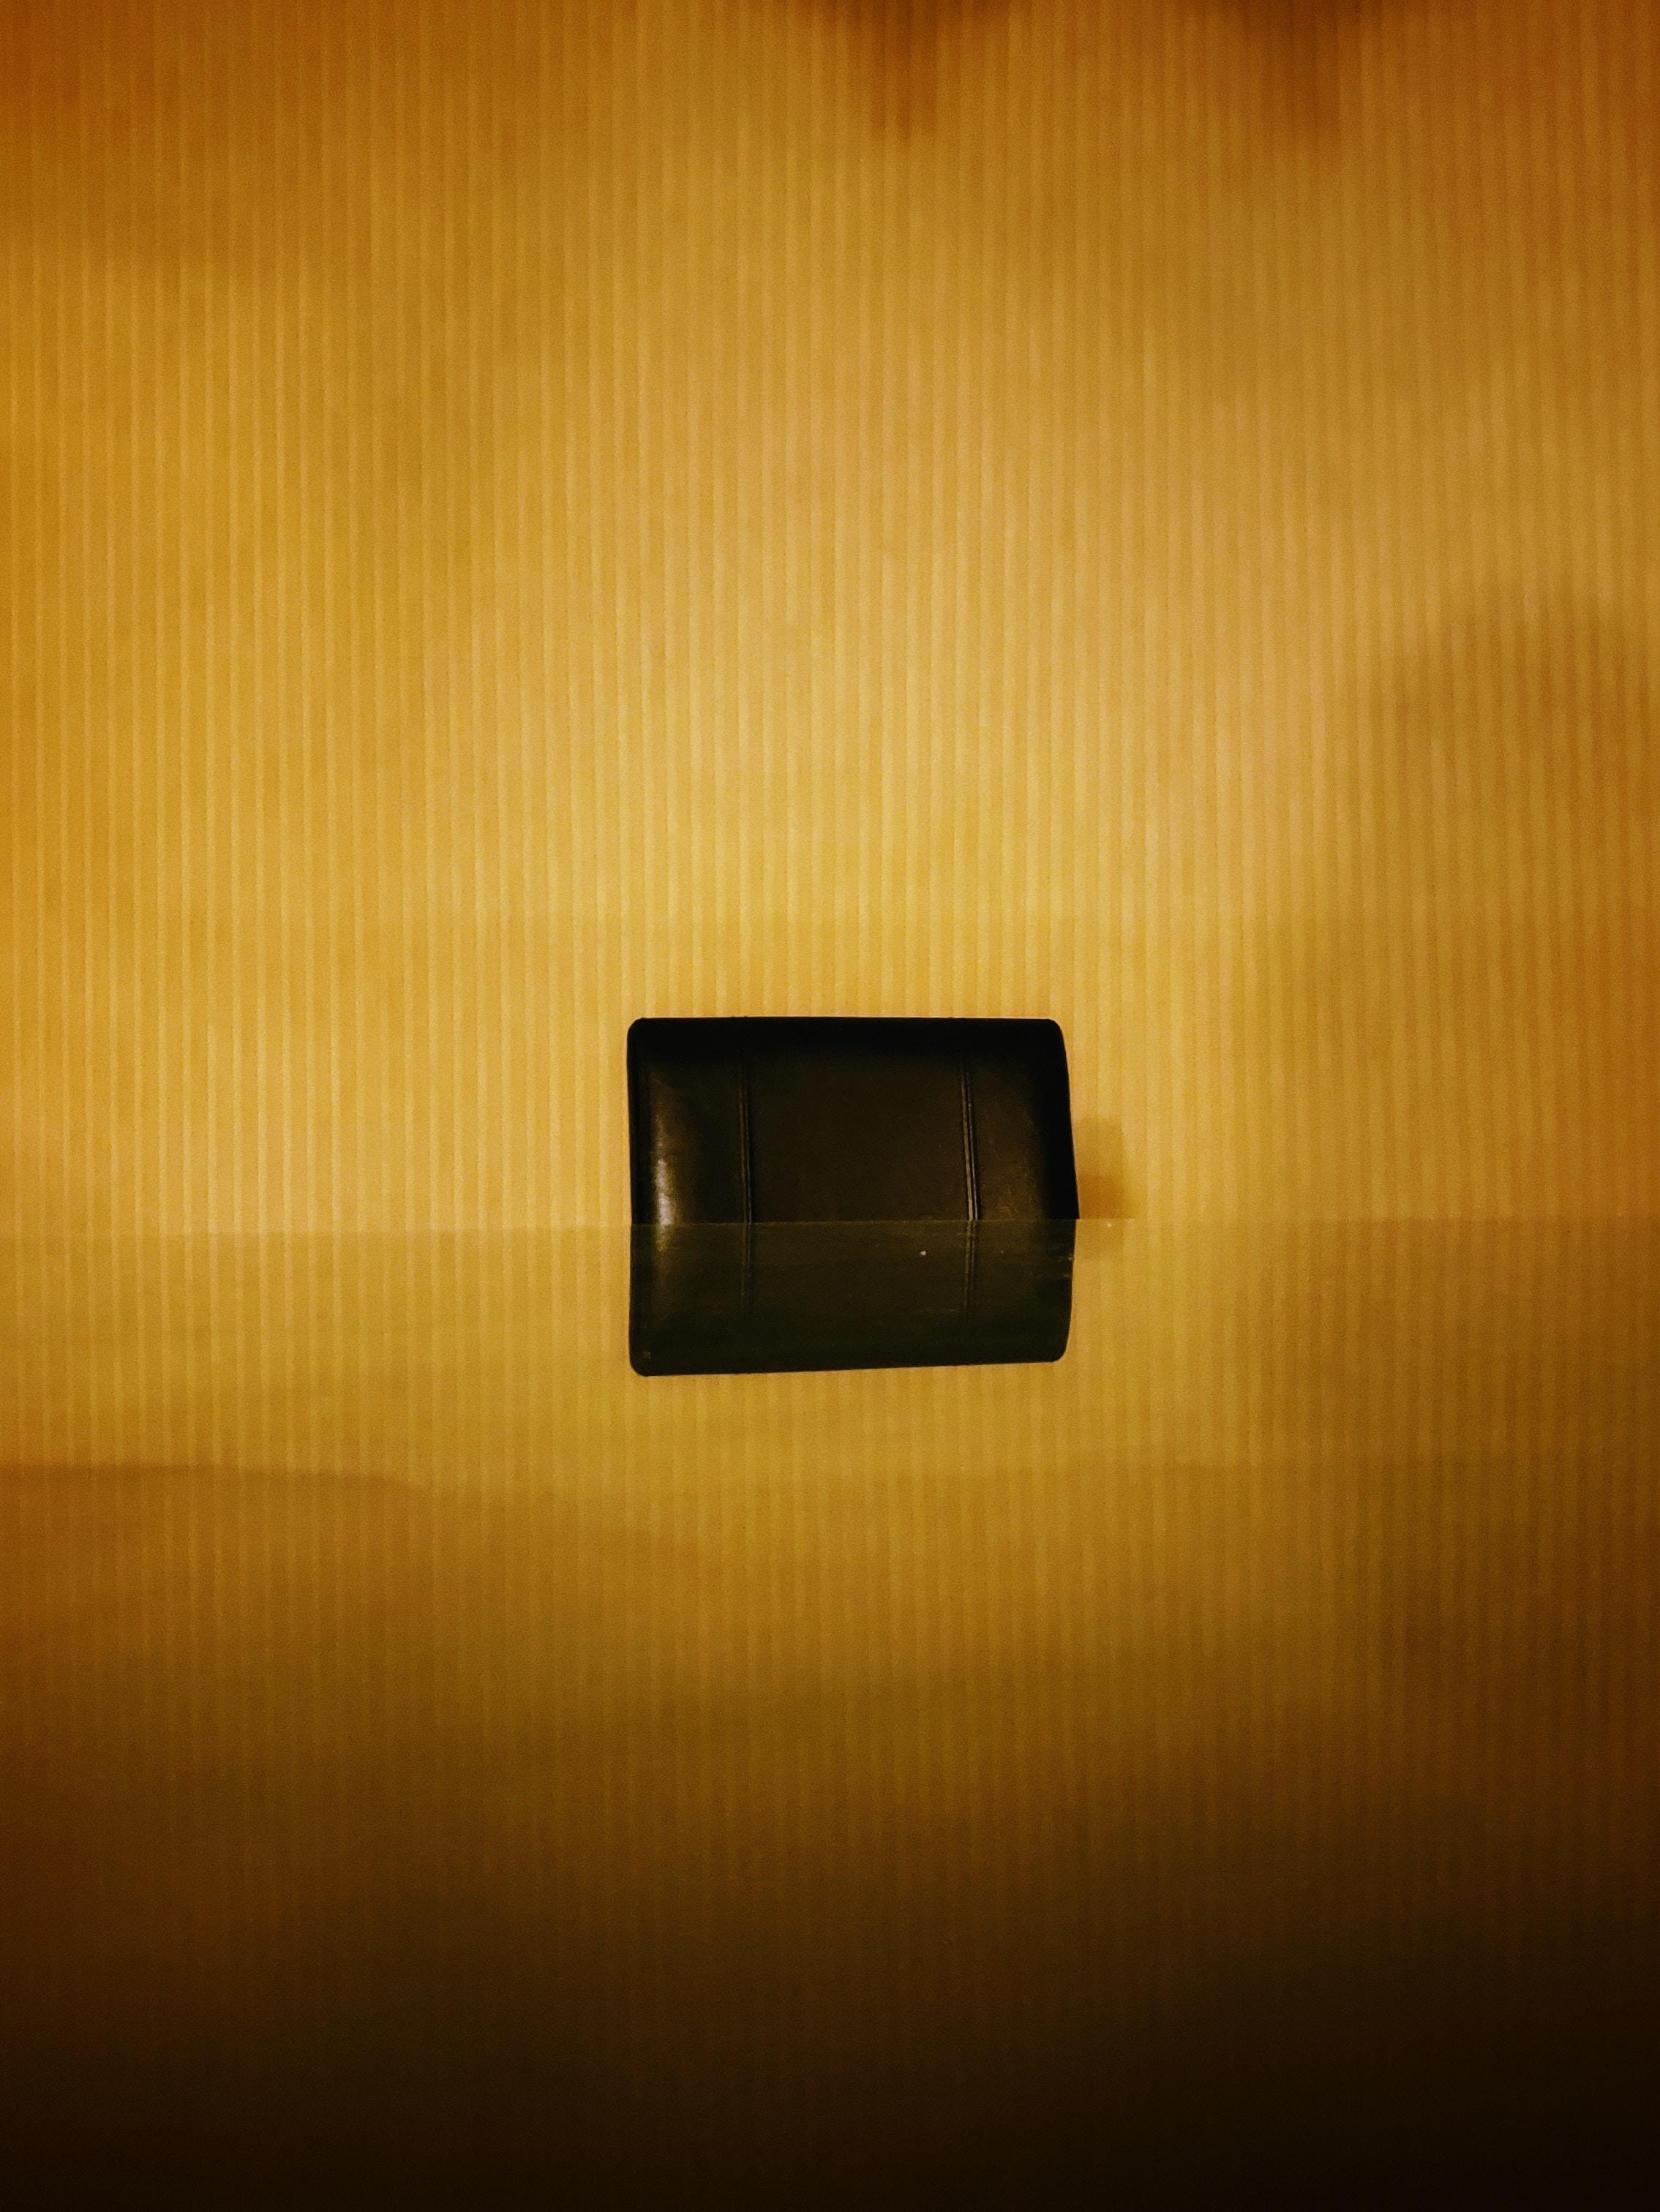 closeup photo of rectangular black component